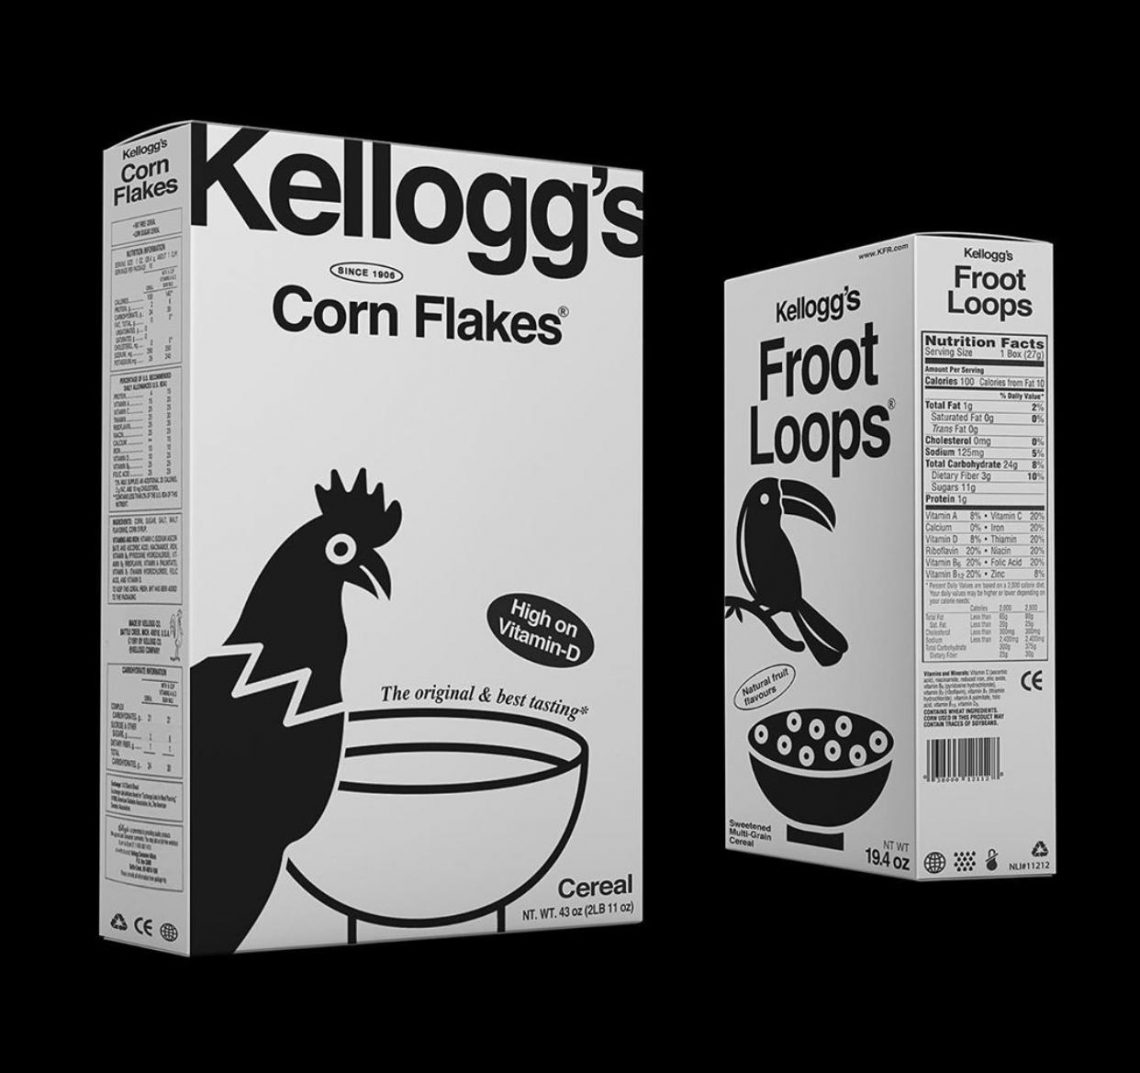 Packaging Kellogg's